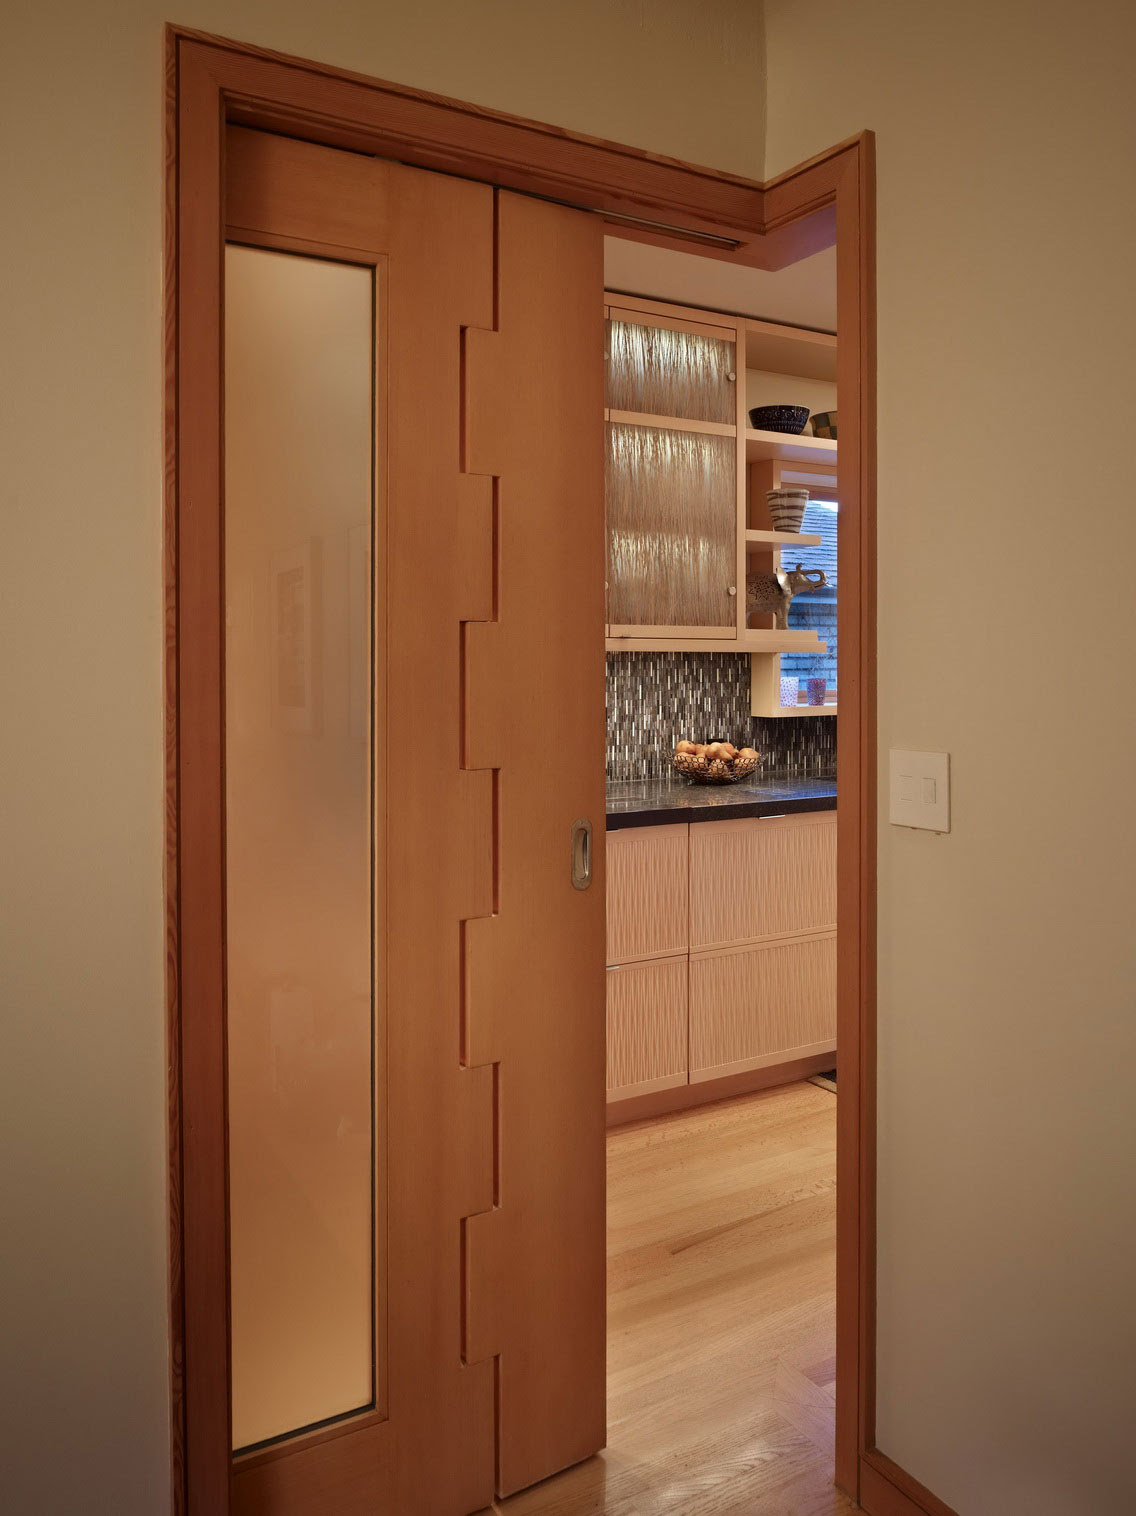 Great Modern Sliding Door Designs to Enhance Your Home ...